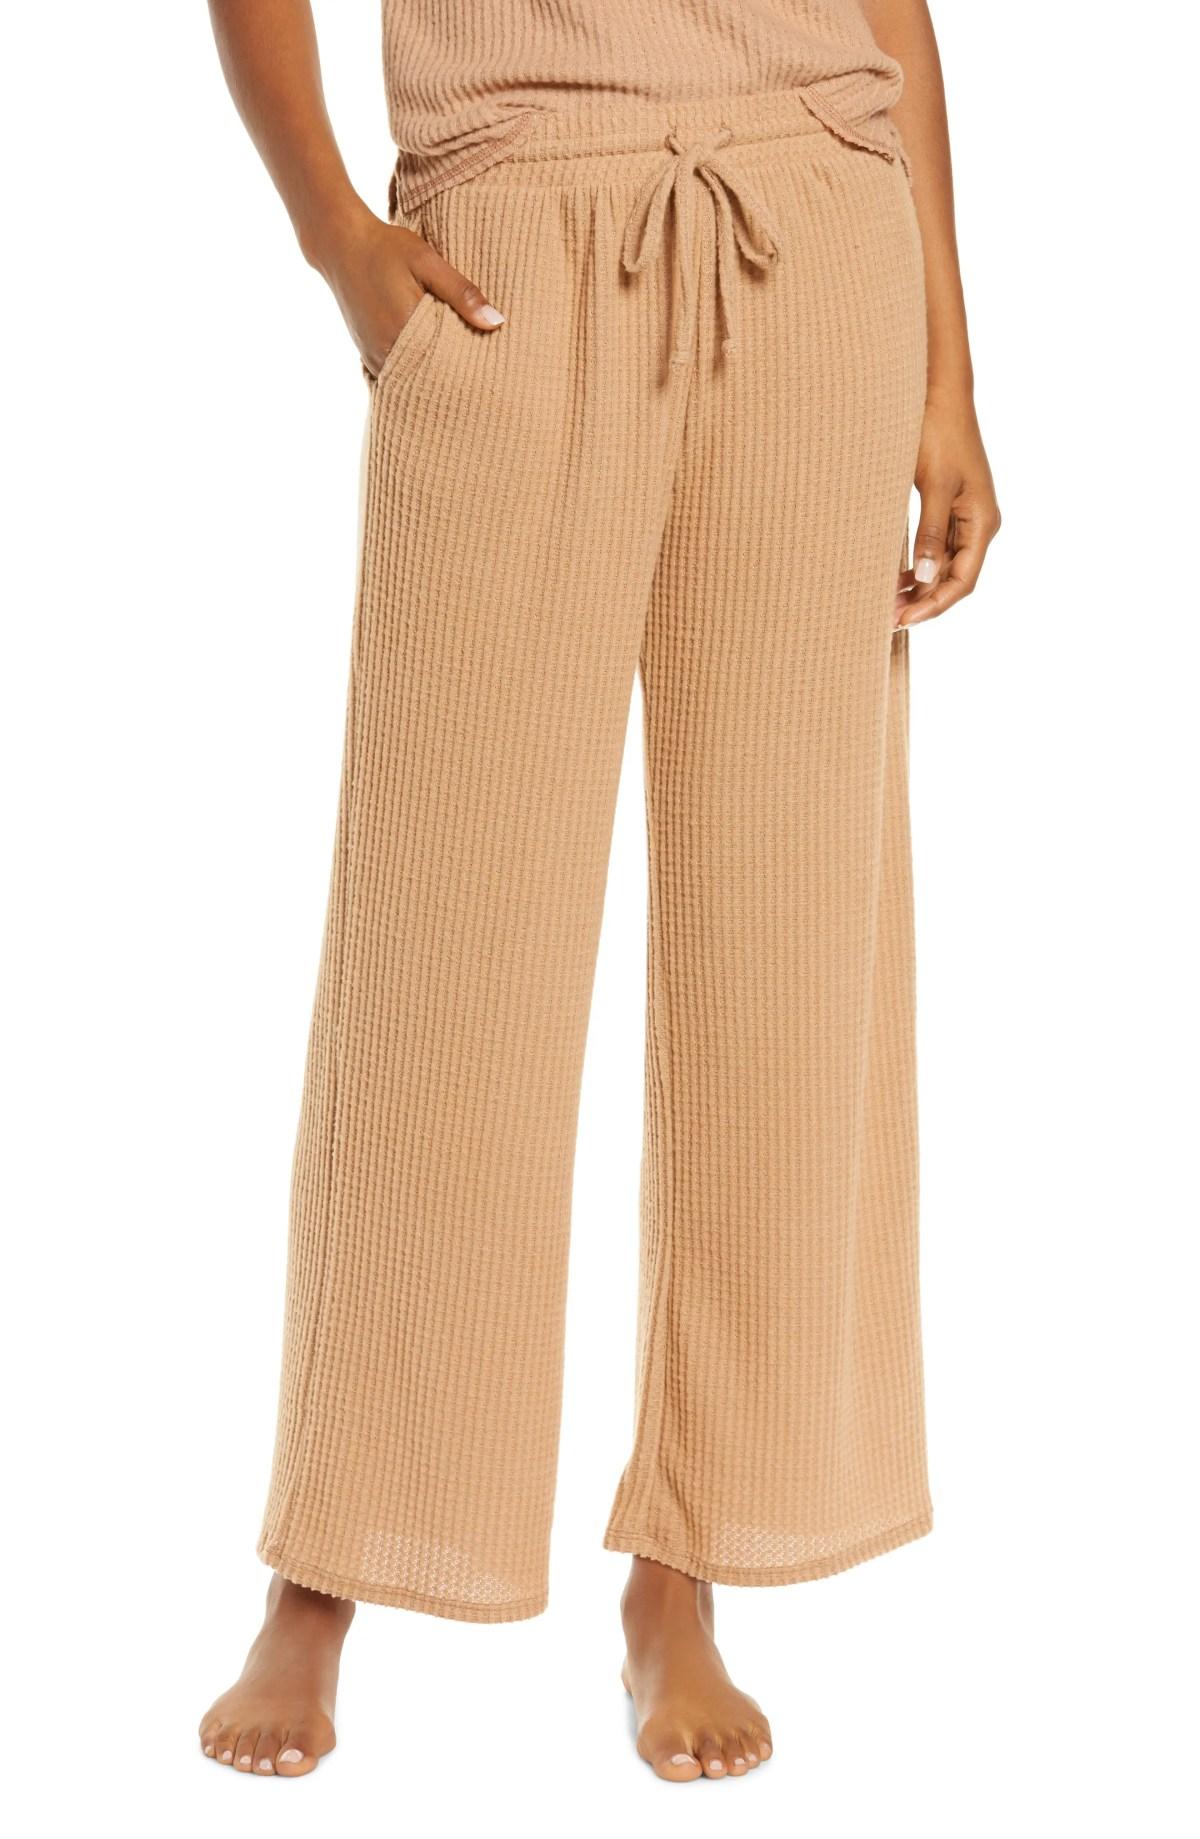 SOCIALITE Waffle Knit Wide Leg Pants, Main, color, CAMEL